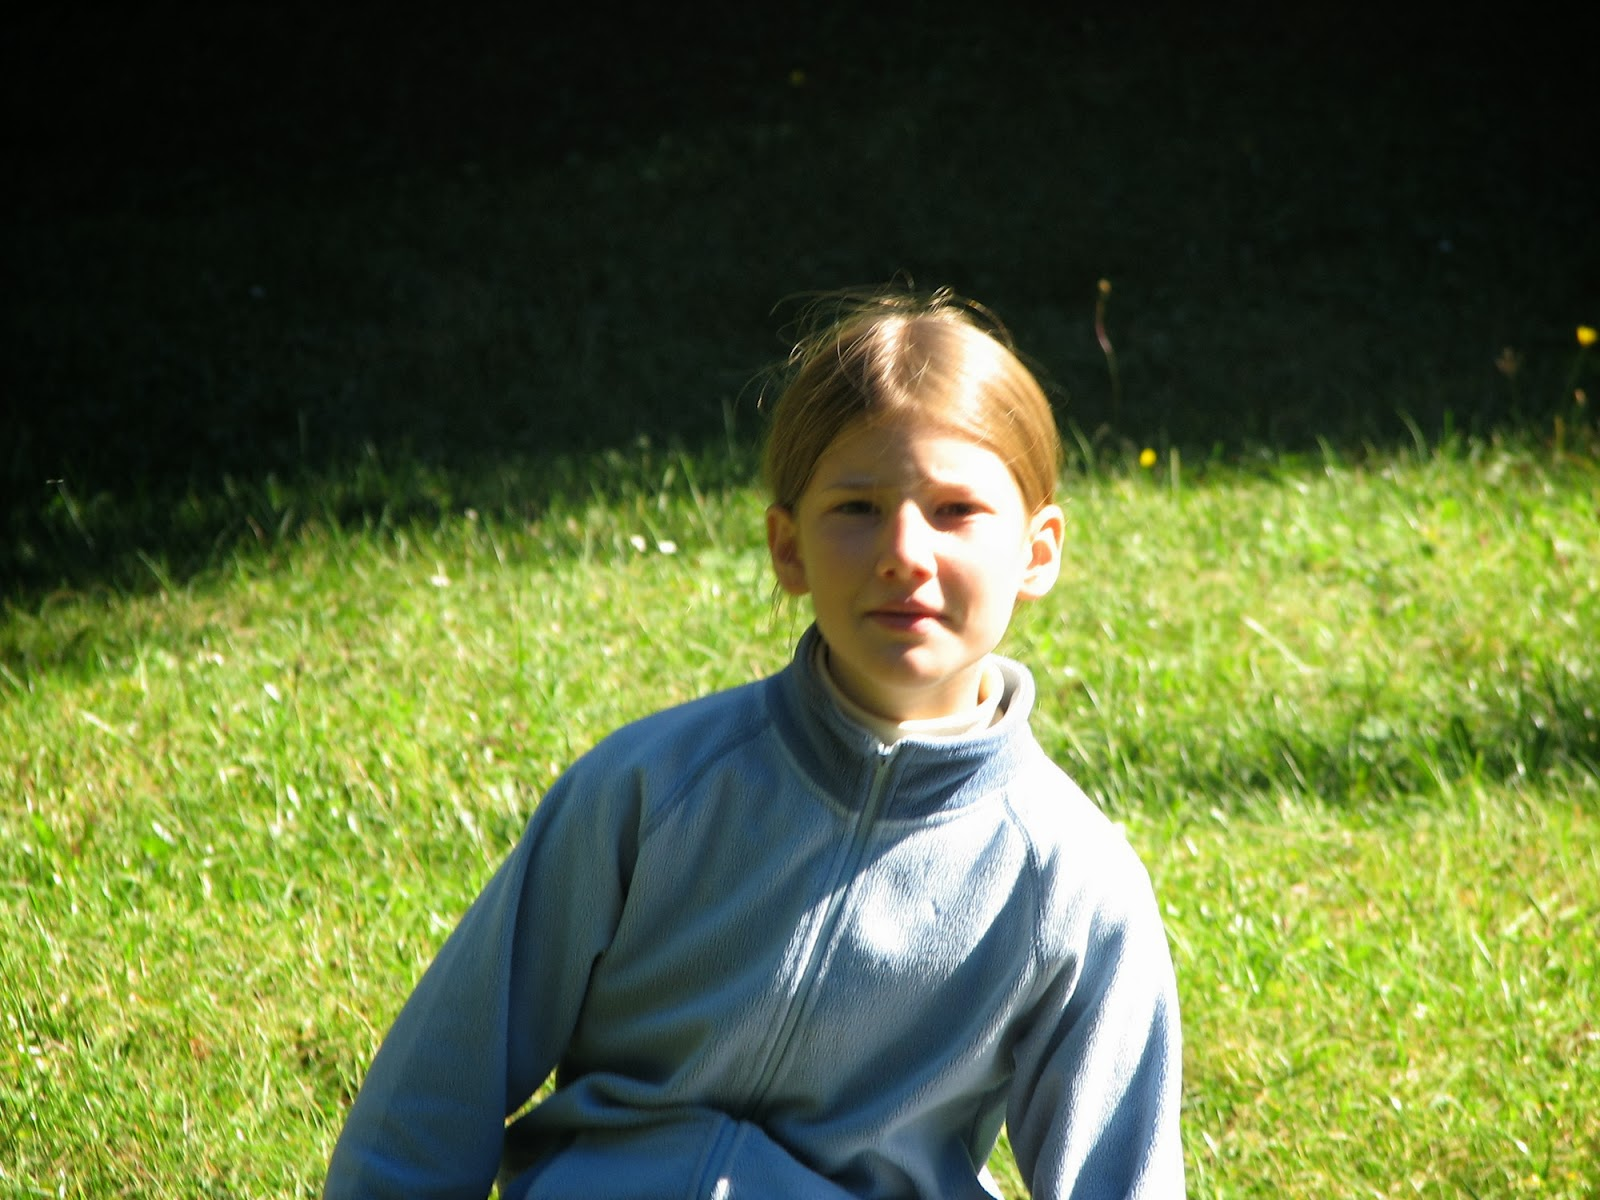 Vodov izlet, Ilirska Bistrica 2005 - Picture%2B140.jpg